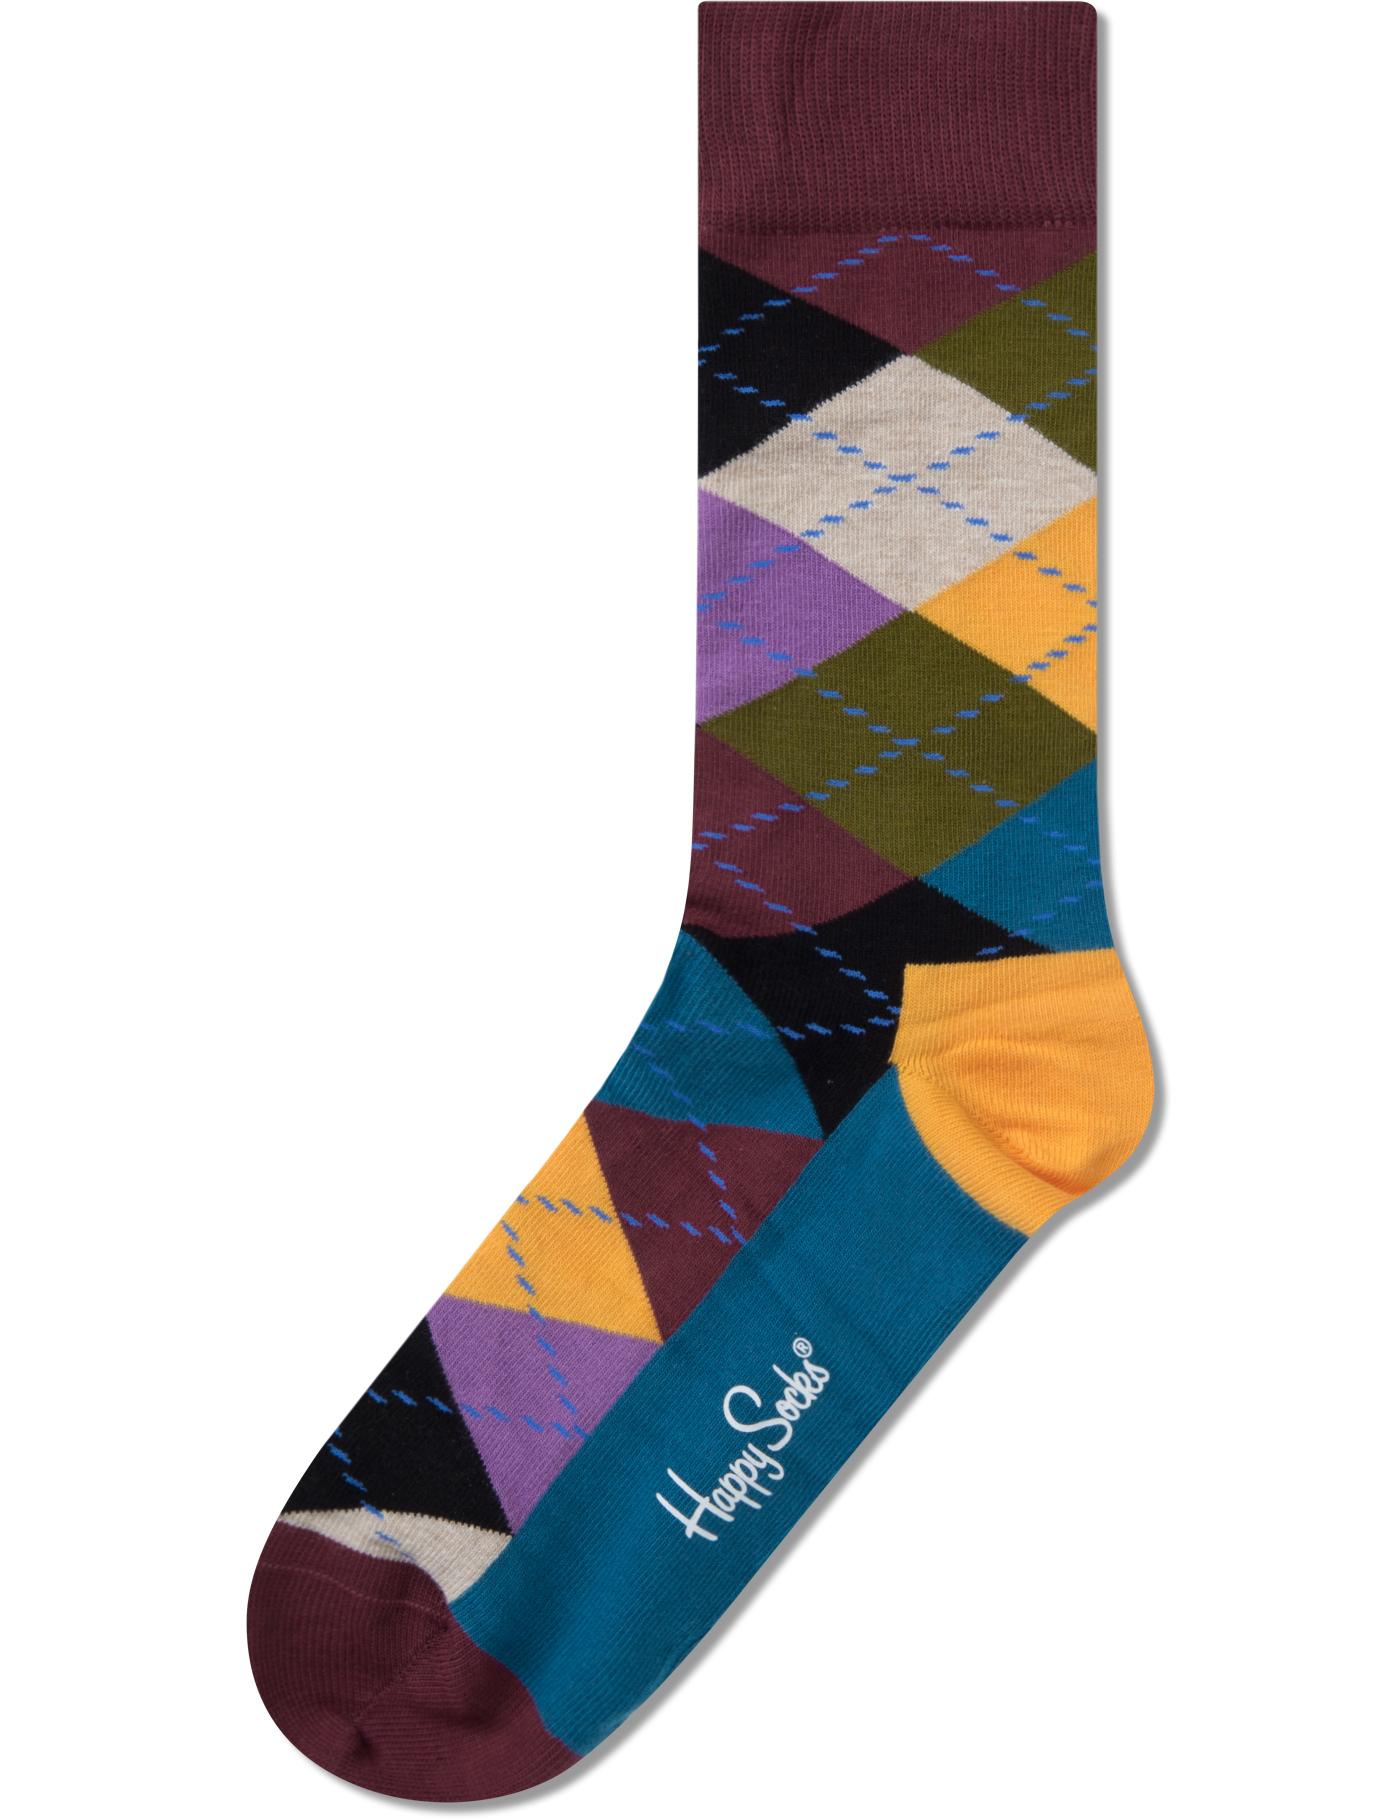 happy socks net worth